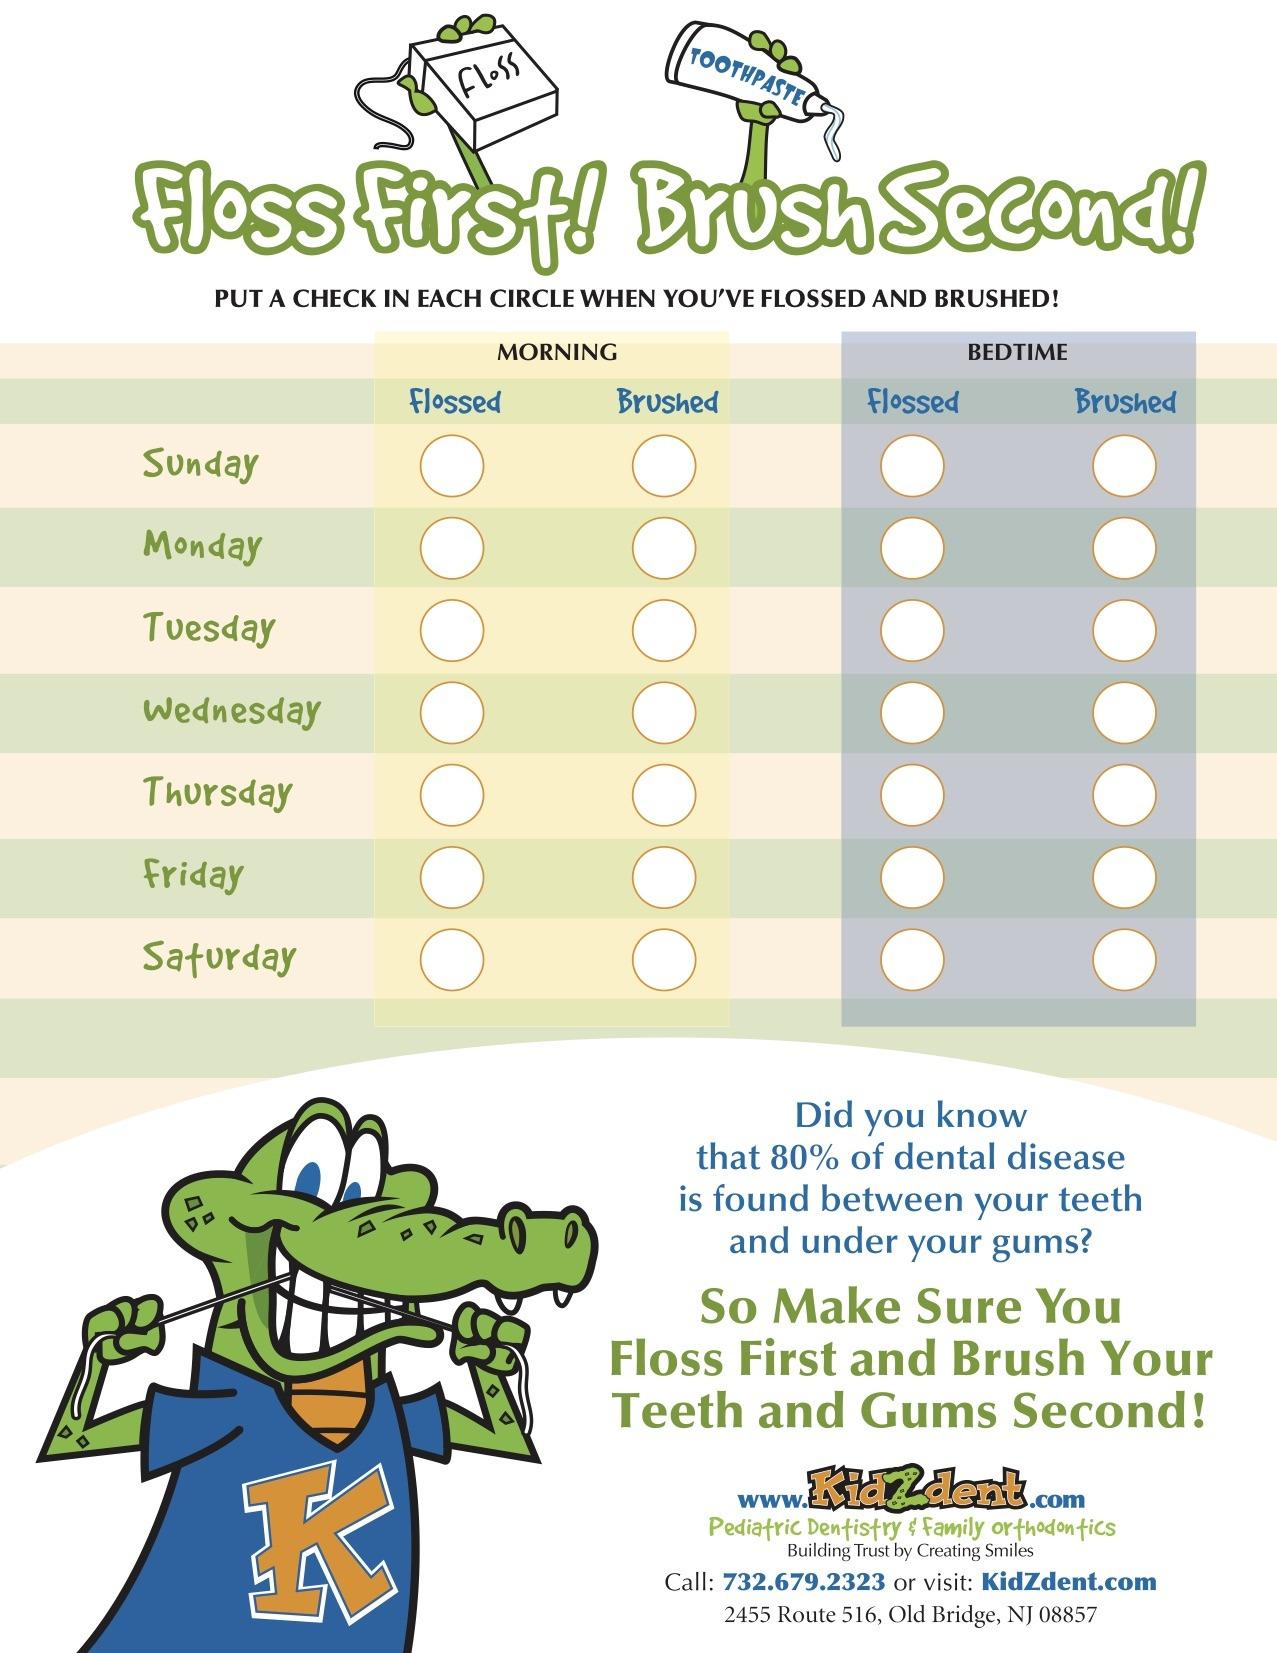 KidZdent Flossing and Brushing